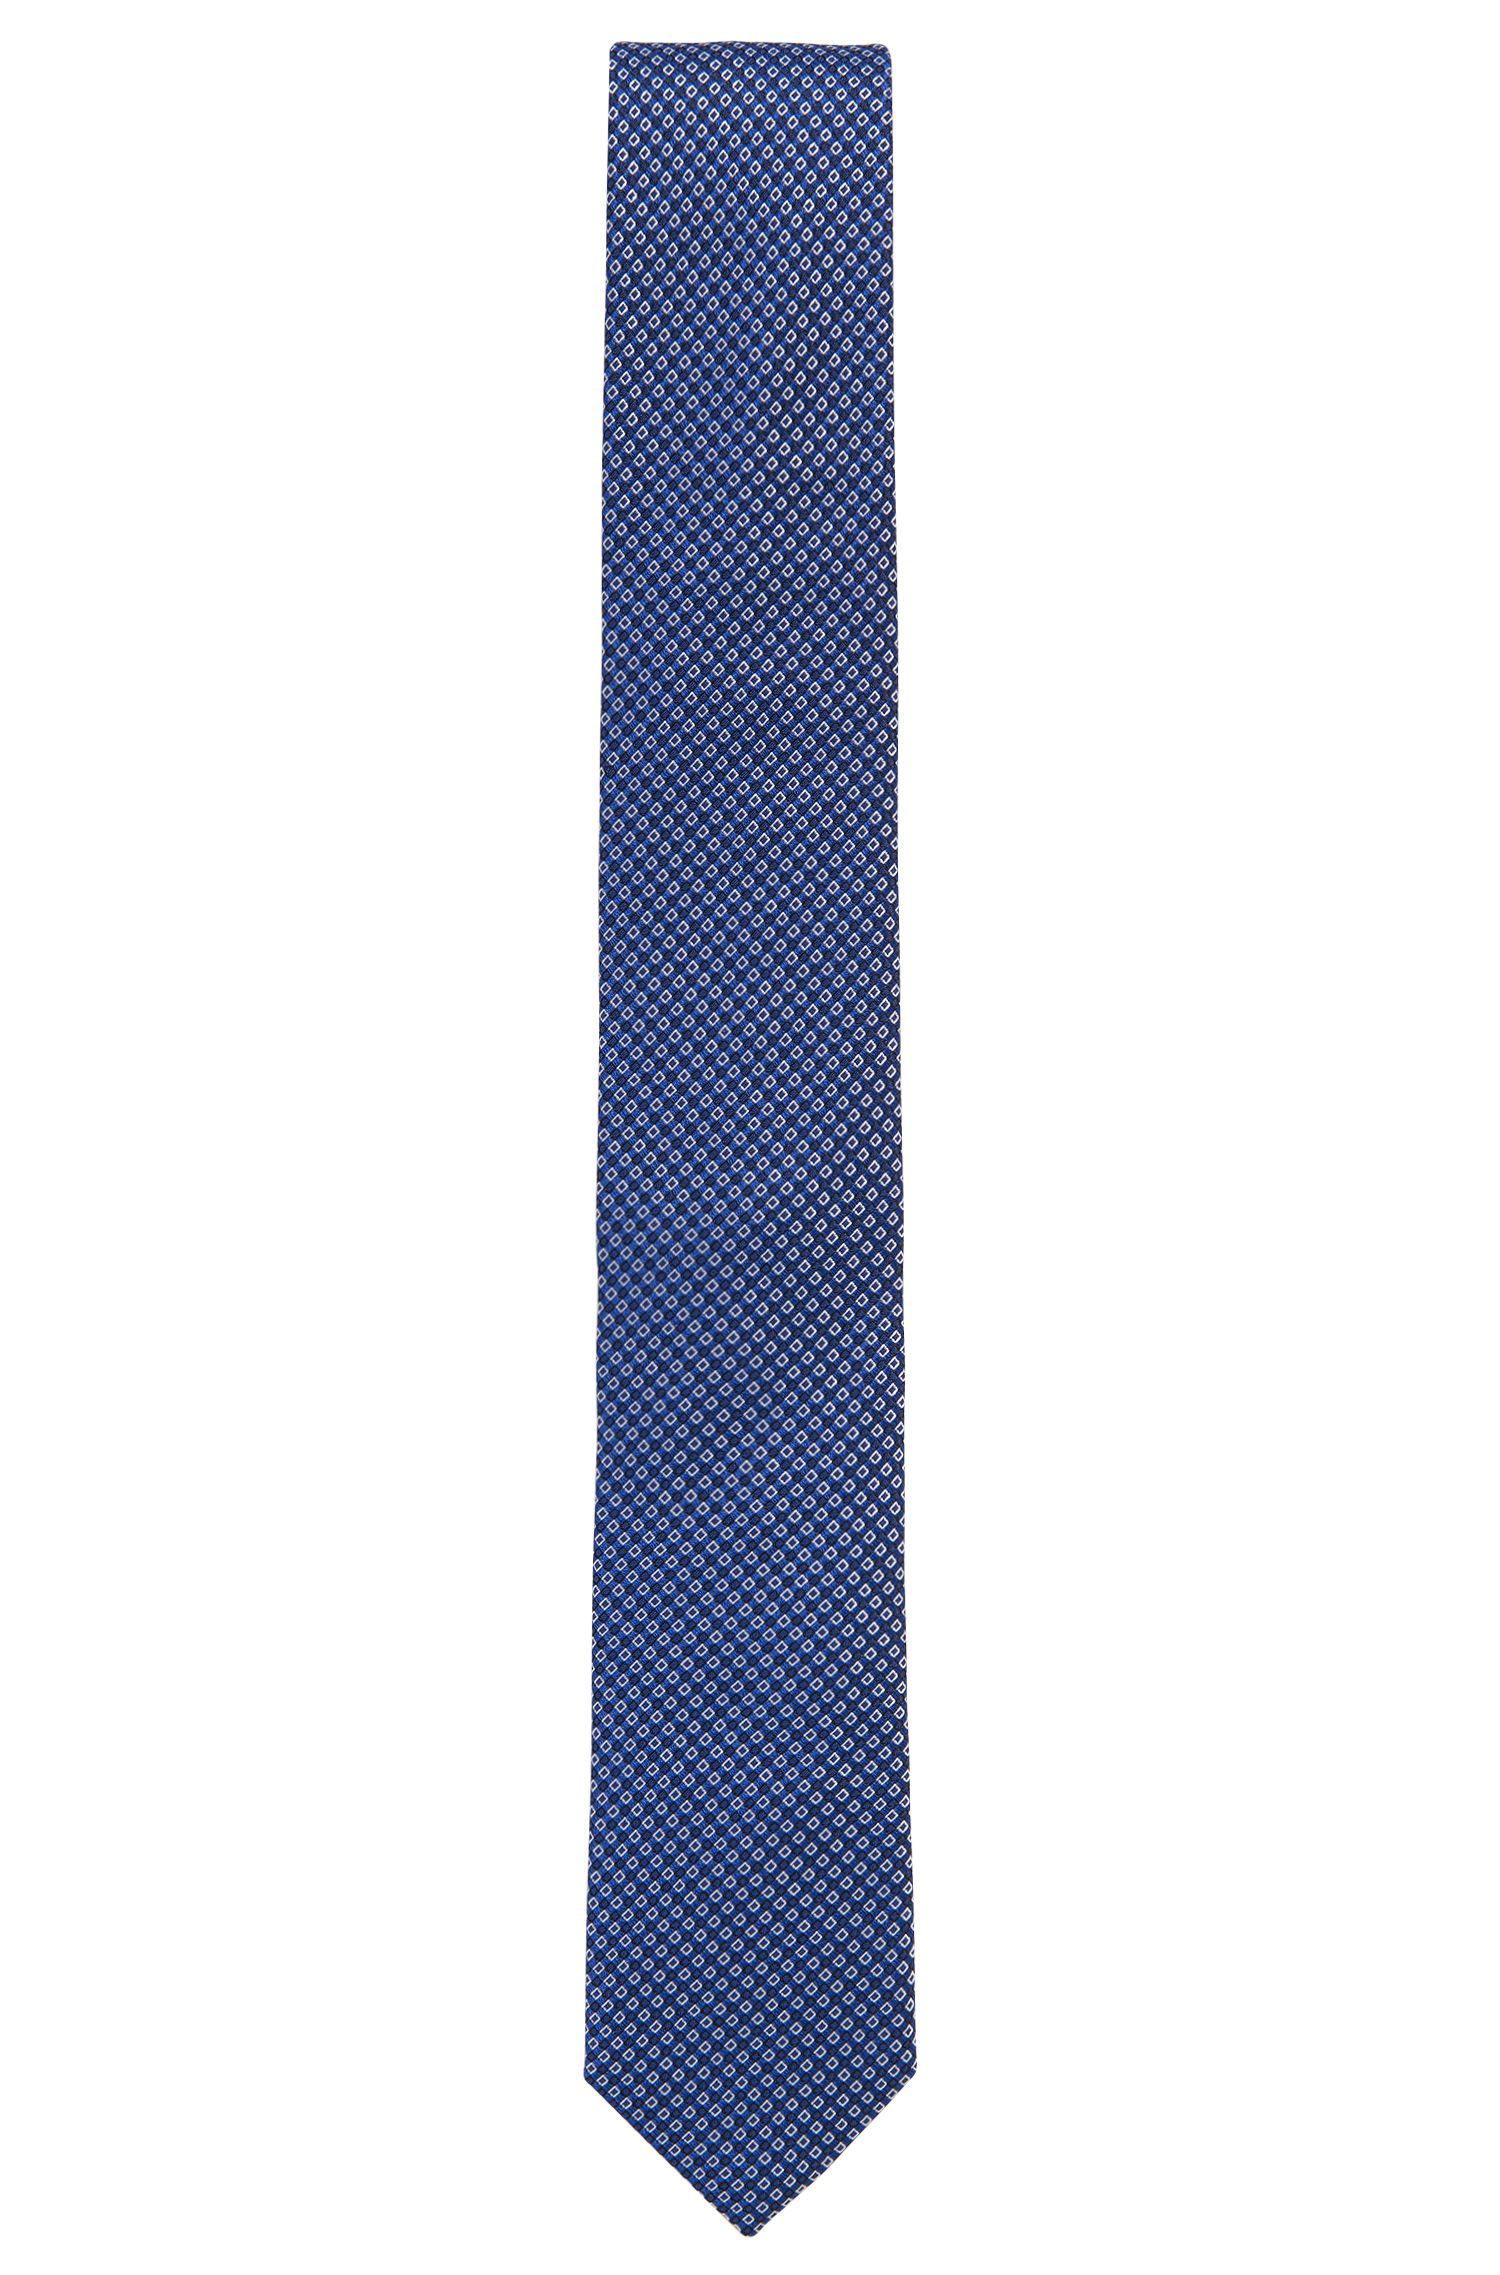 Micro-Patterned Italian Silk Slim Tie, Blue